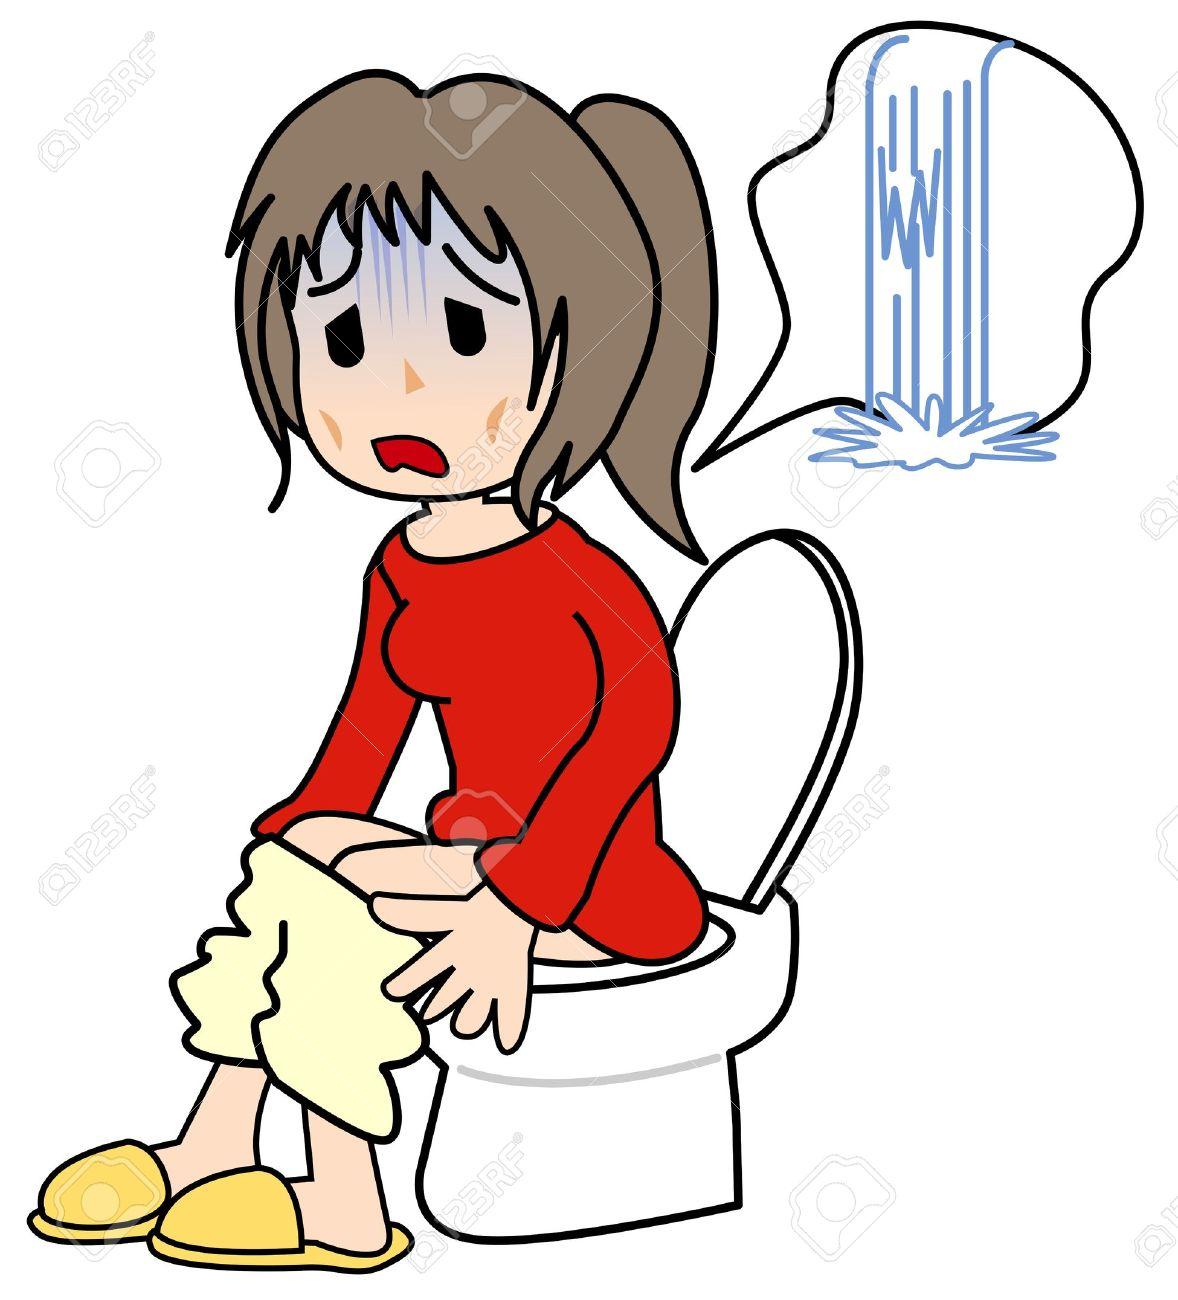 Diarrhea clipart » Clipart Station.